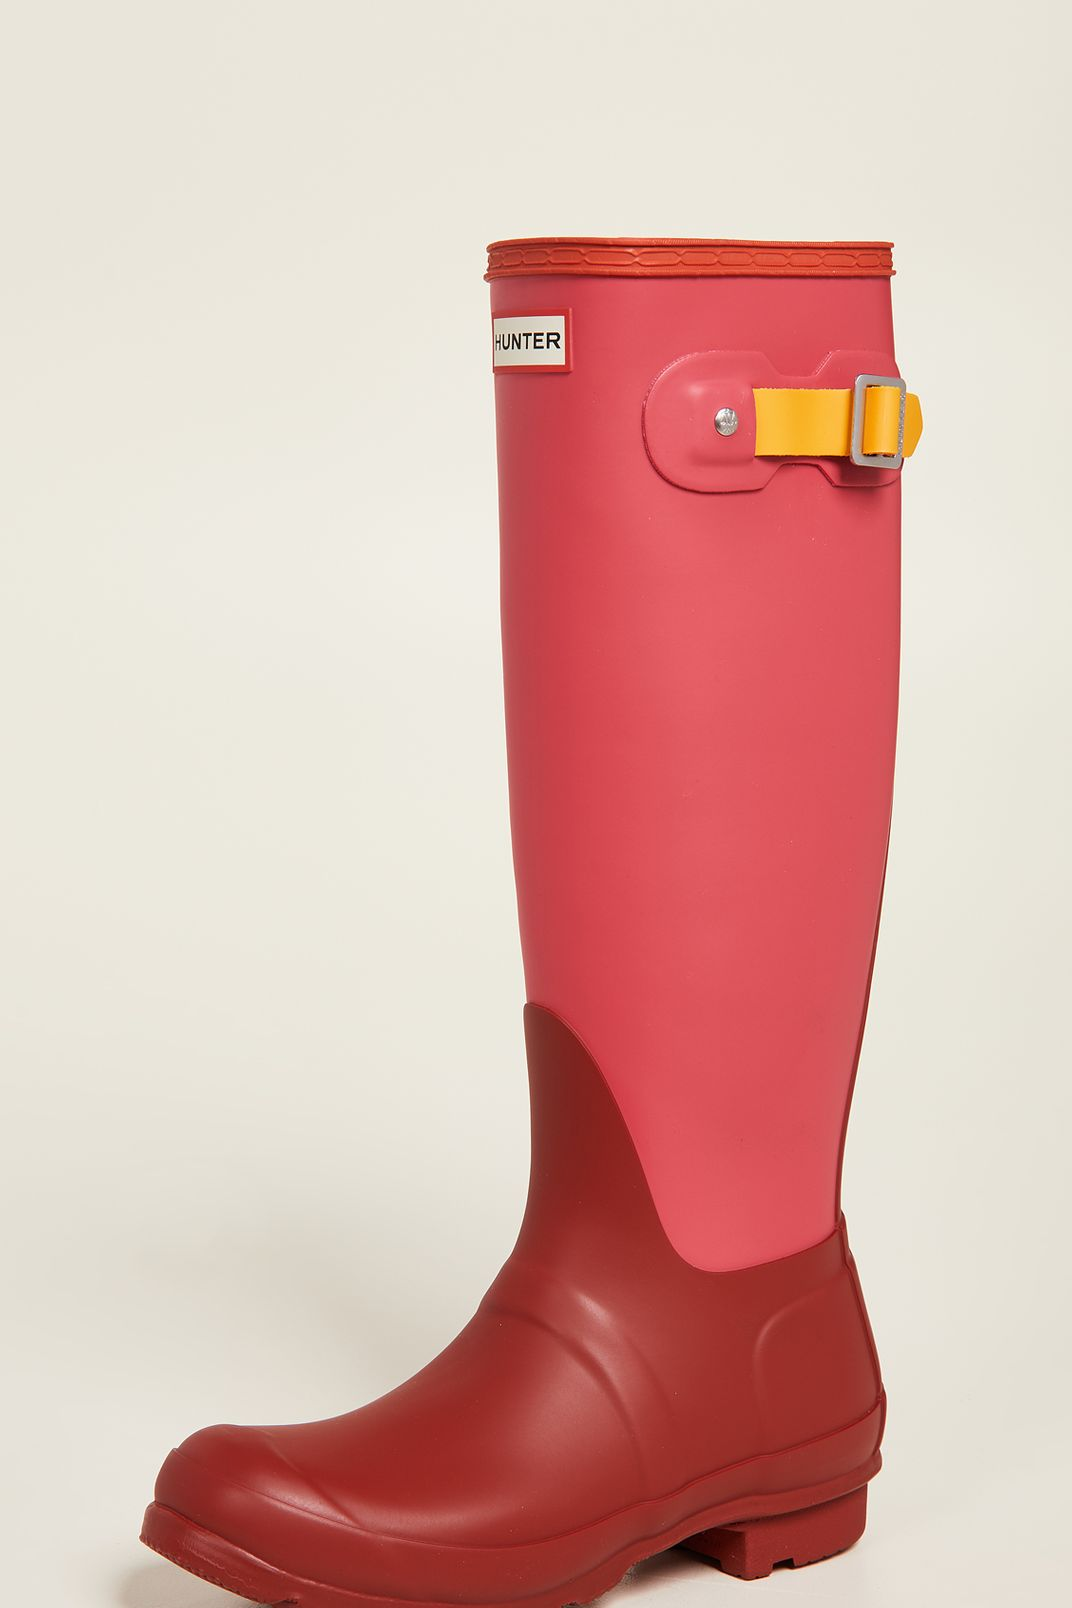 Hunter Boots Original Tall Colorblock Boots